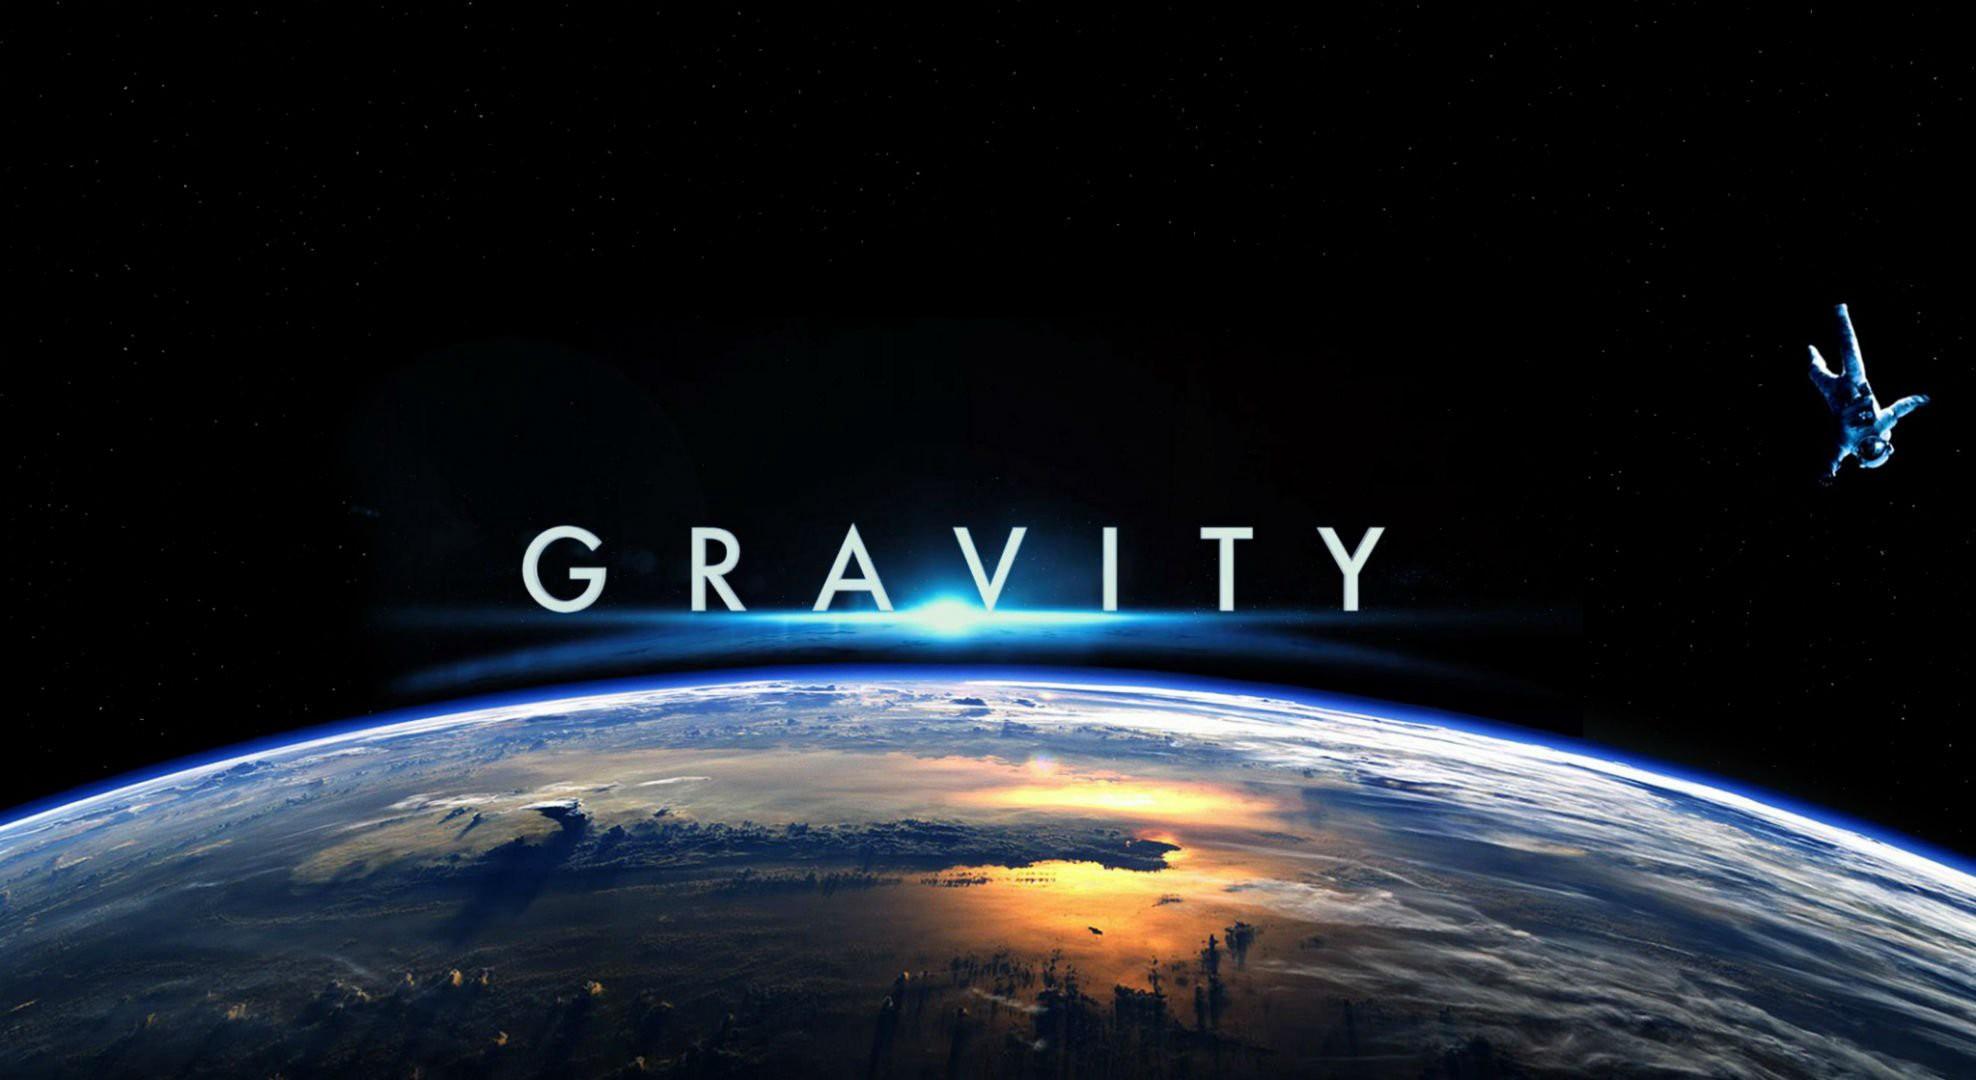 "Gravity ""width ="" 1976 ""height ="" 1080 ""srcset ="" https://www.samma3a.com/tech/en/wp-content/uploads/sites/2/2018/06/gravity.jpeg 1976w, https: //www.samma3a.com/tech/en/wp-content/uploads/sites/2/2018/06/gravity-300x164.jpeg 300w, https://www.samma3a.com/tech/en/wp-content /uploads/sites/2/2018/06/gravity-768x420.jpeg 768w, https://www.samma3a.com/tech/en/wp-content/uploads/sites/2/2018/06/gravity-1024x560. jpeg 1024w, https://www.samma3a.com/tech/en/wp-content/uploads/sites/2/2018/06/gravity-696x380.jpeg 696w, https://www.samma3a.com/tech/ fr / wp-content / uploads / site / 2/2018/06 / Gravity-1068x584.jpeg 1068w ""tailles ="" (largeur maximale: 1976px) 100vw, 1976px"